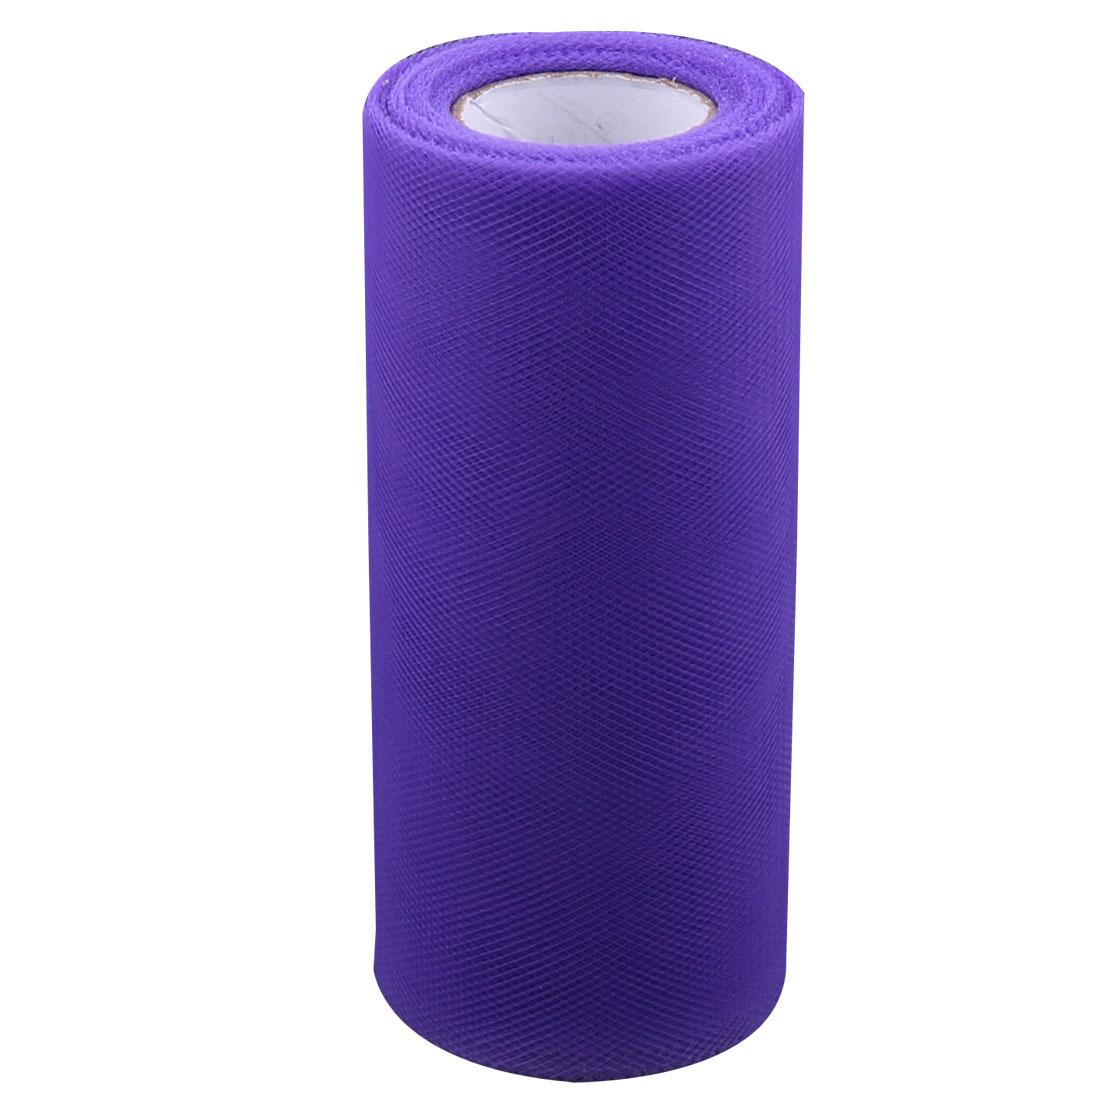 Wedding Party Banquet House Nylon Mesh Tulle Roll Spool Decor Dark Purple 25 Yards